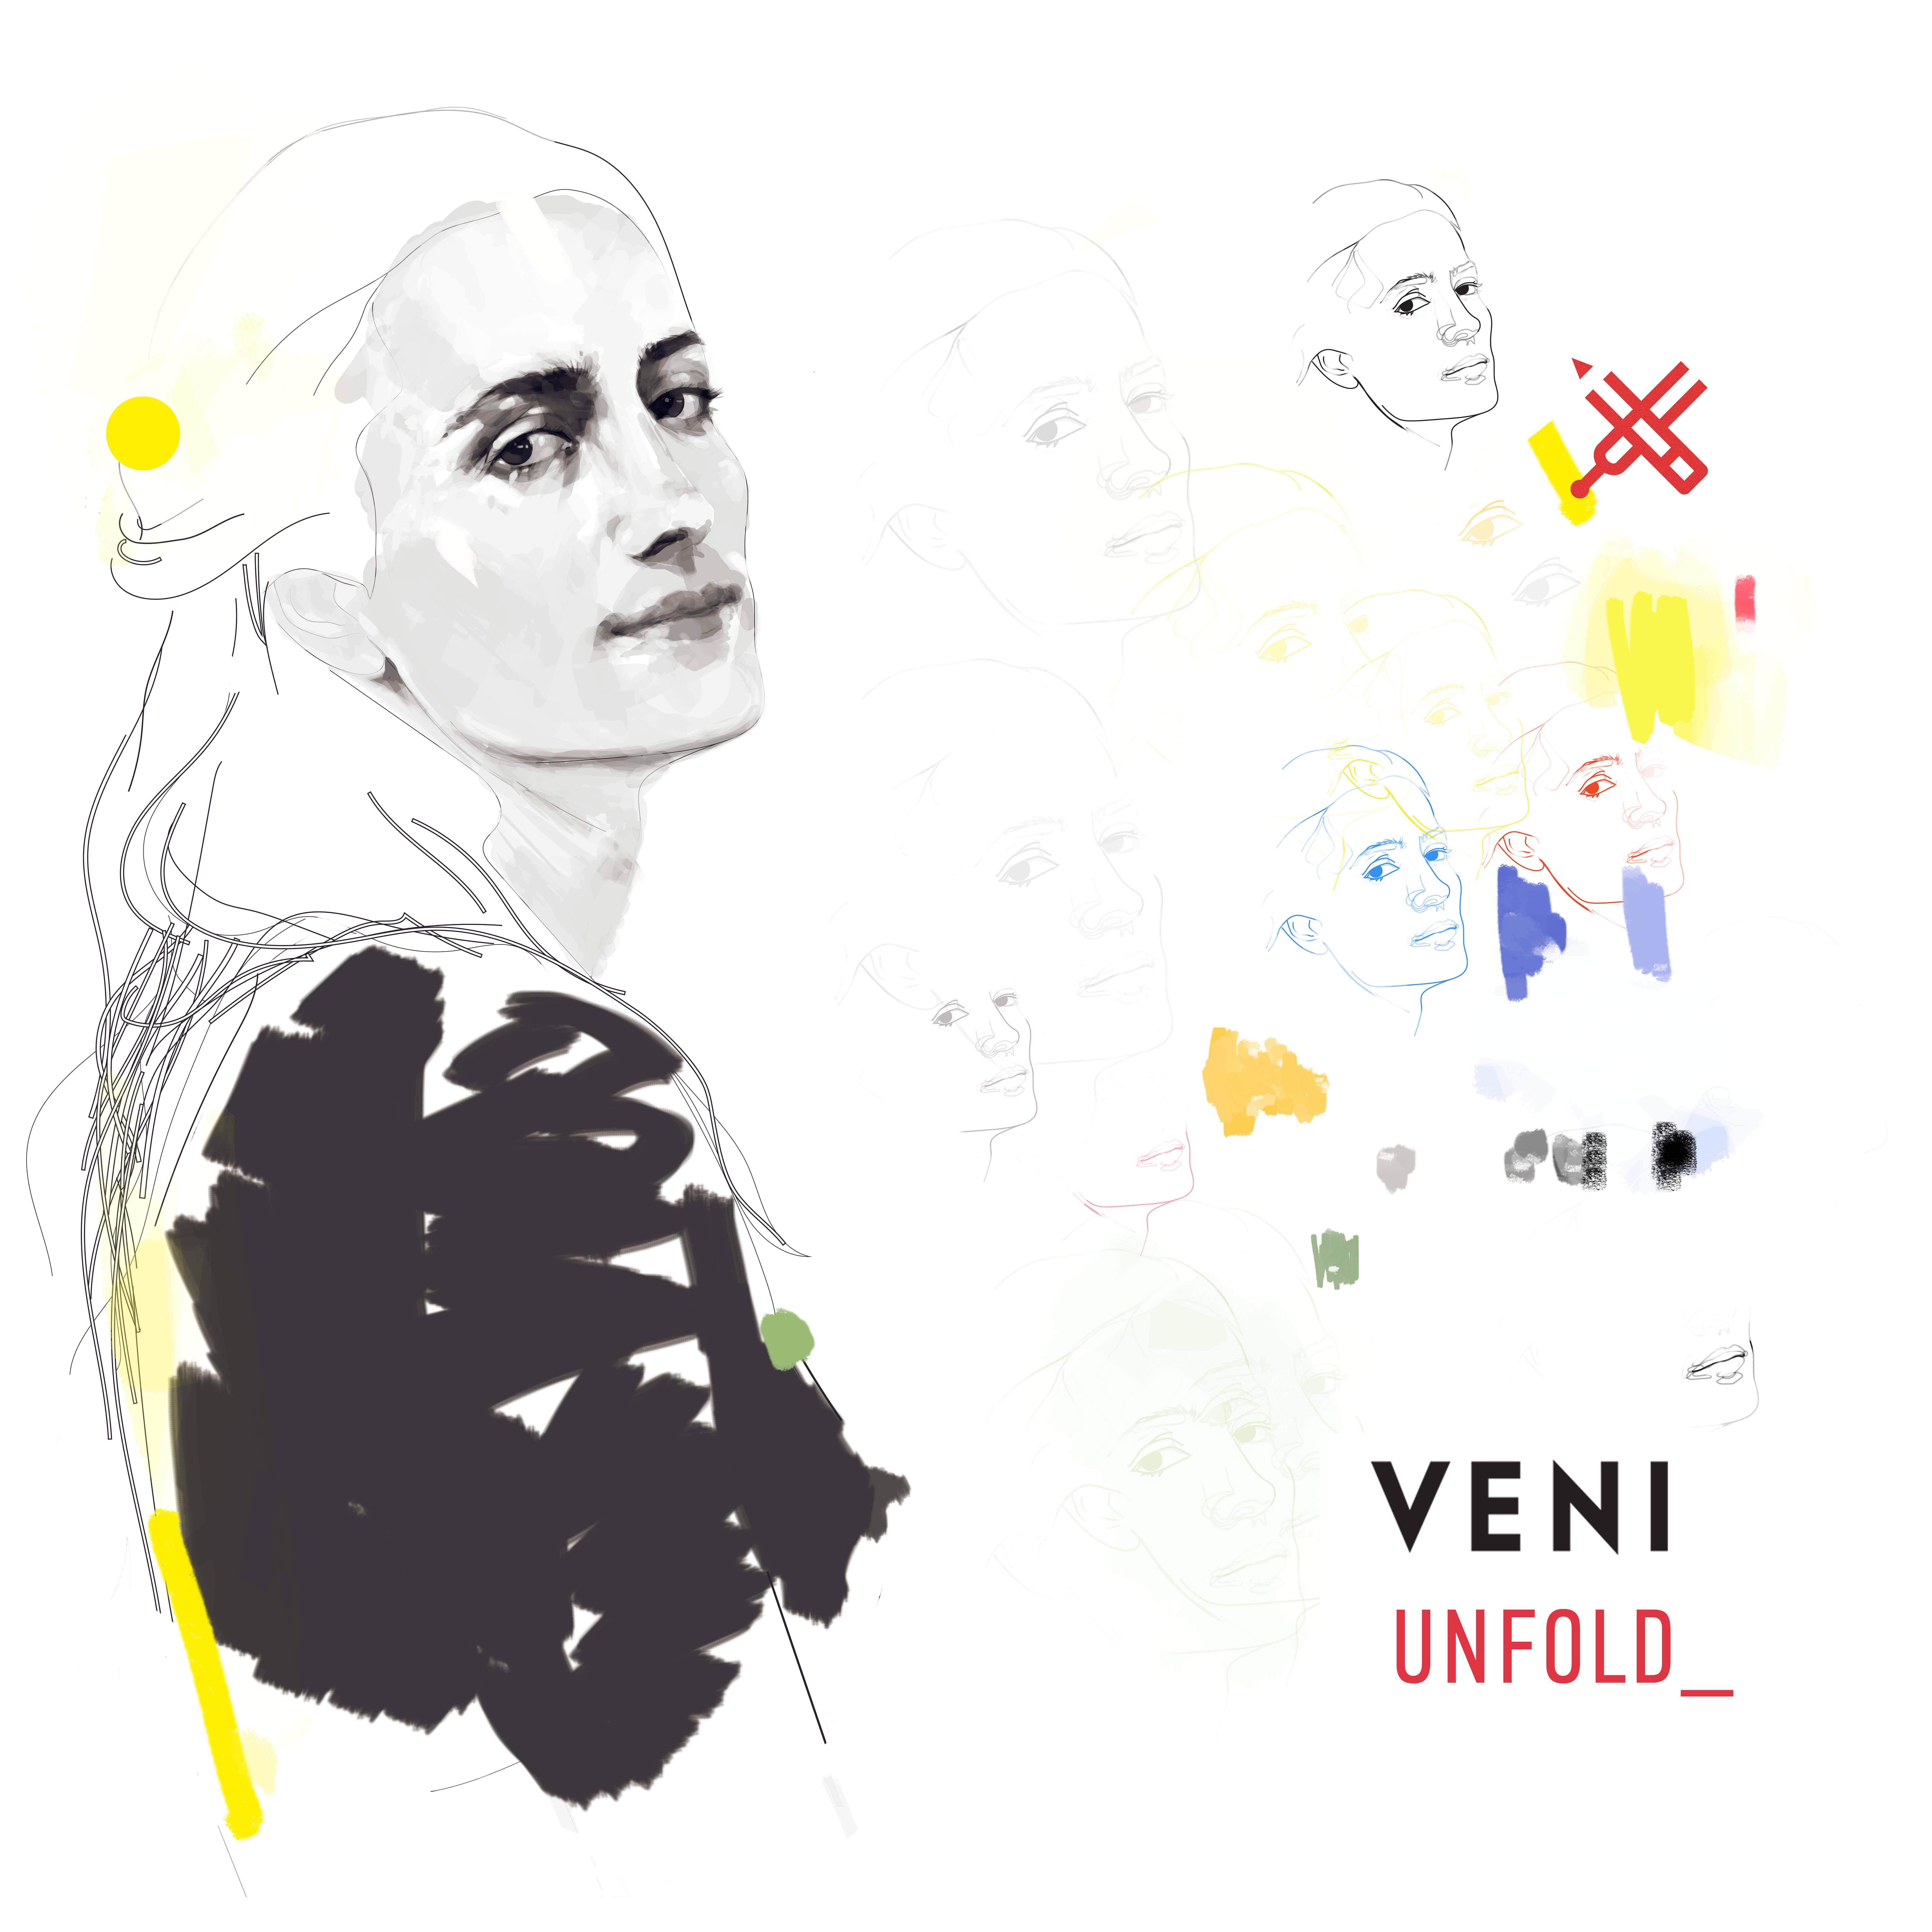 VENI_UNFOLD